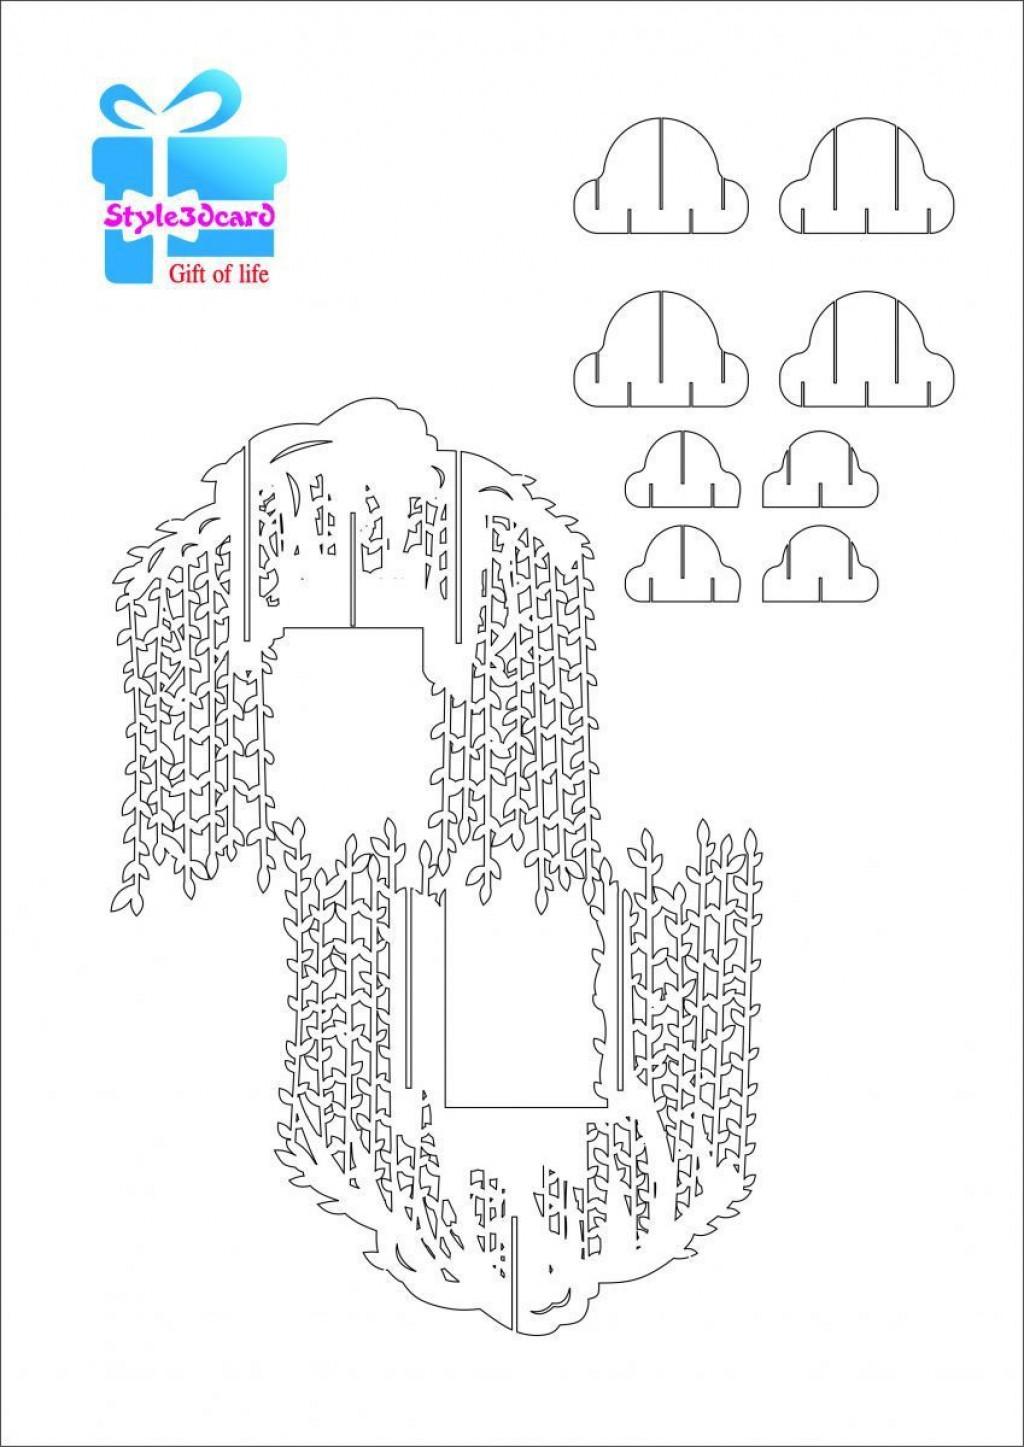 002 Wonderful Pop Up Card Template High Def  Templates Birthday Free Download Printable FlowerLarge